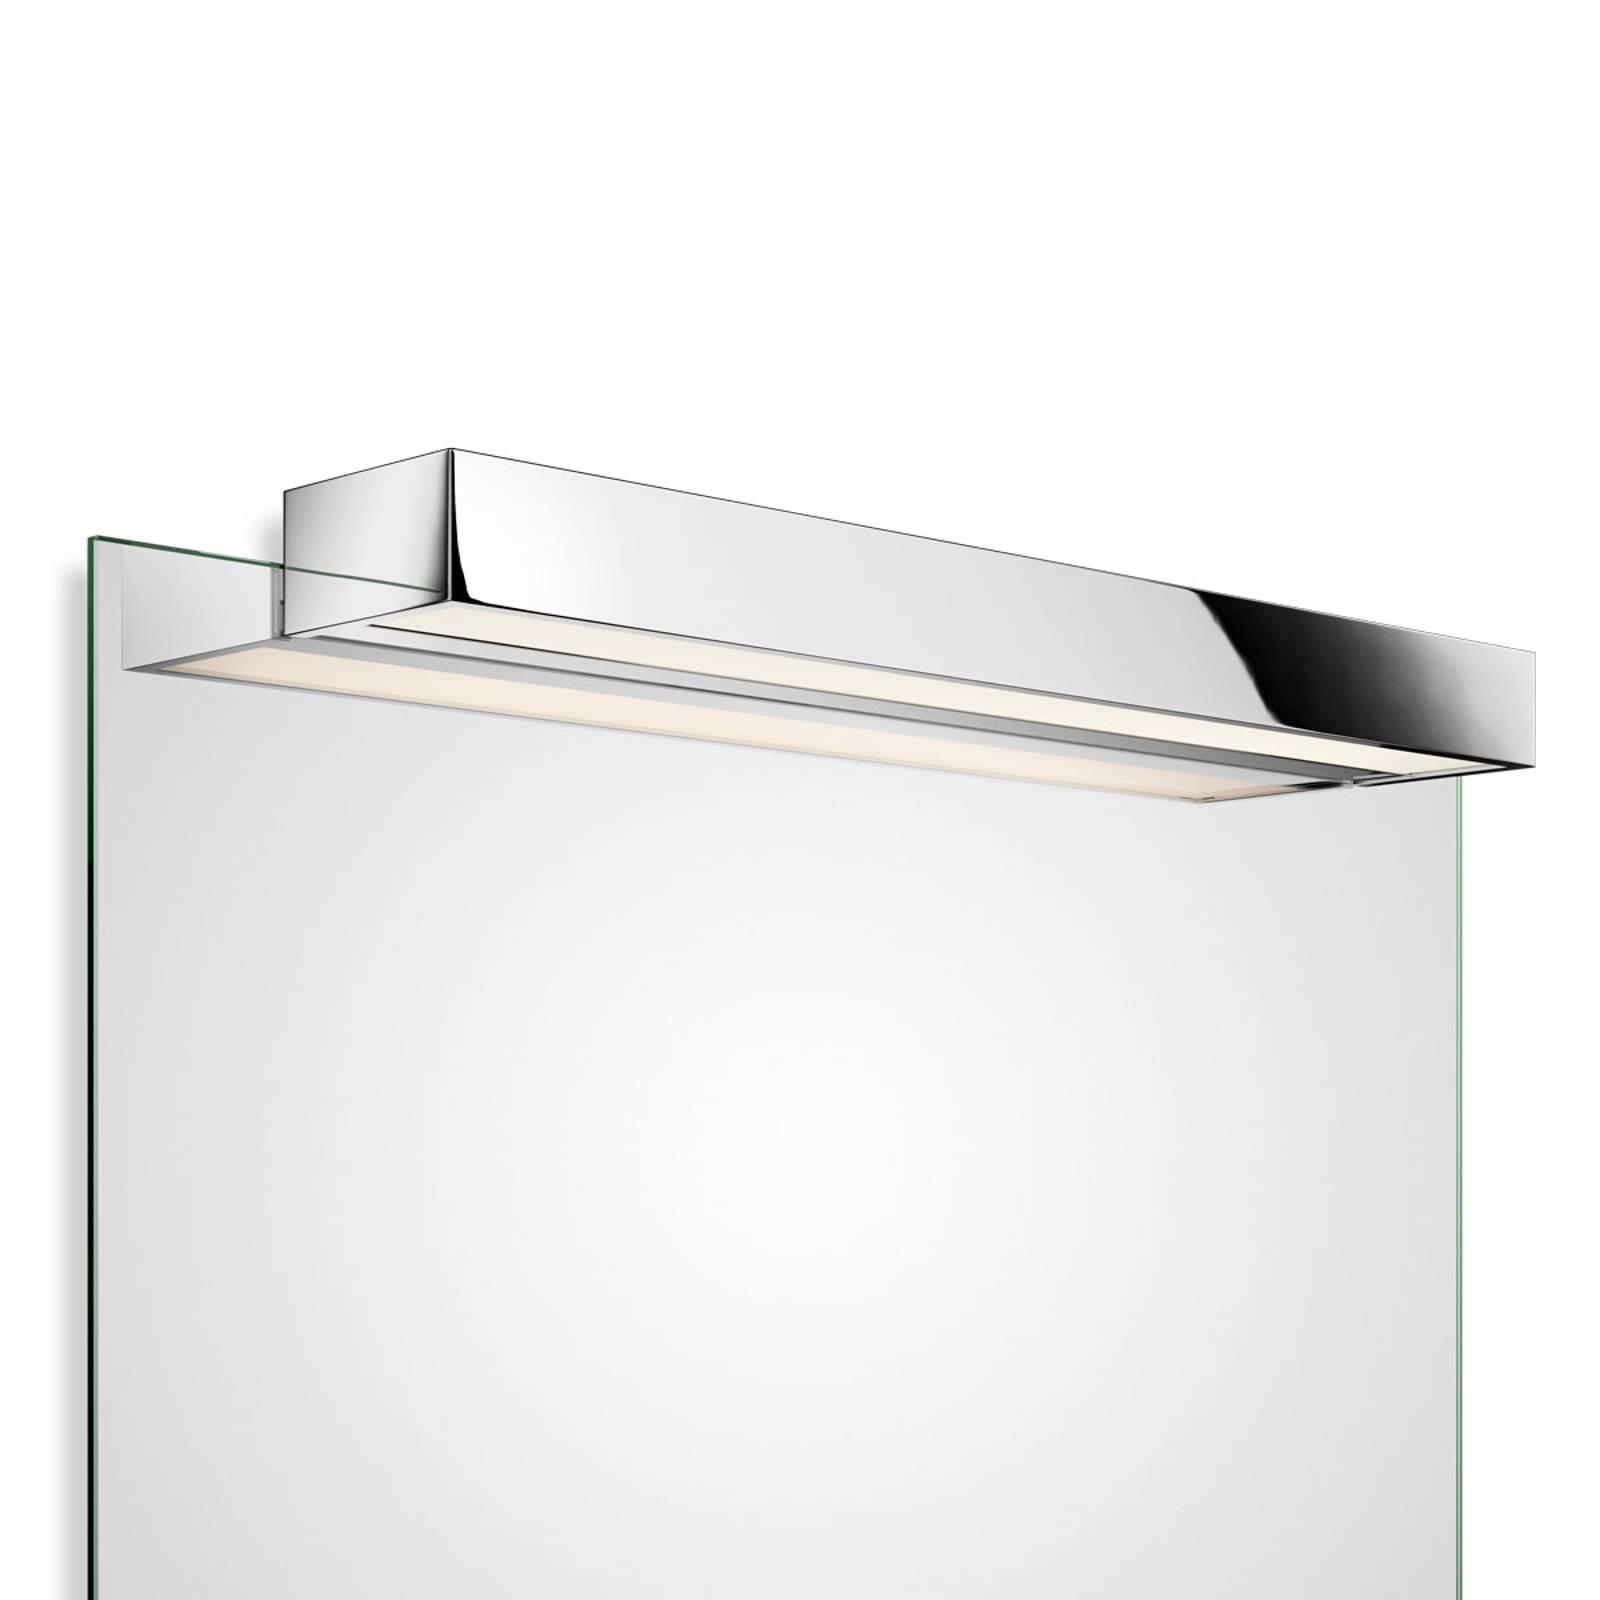 Decor Walther Box 1-60 N applique miroir LED 3000K